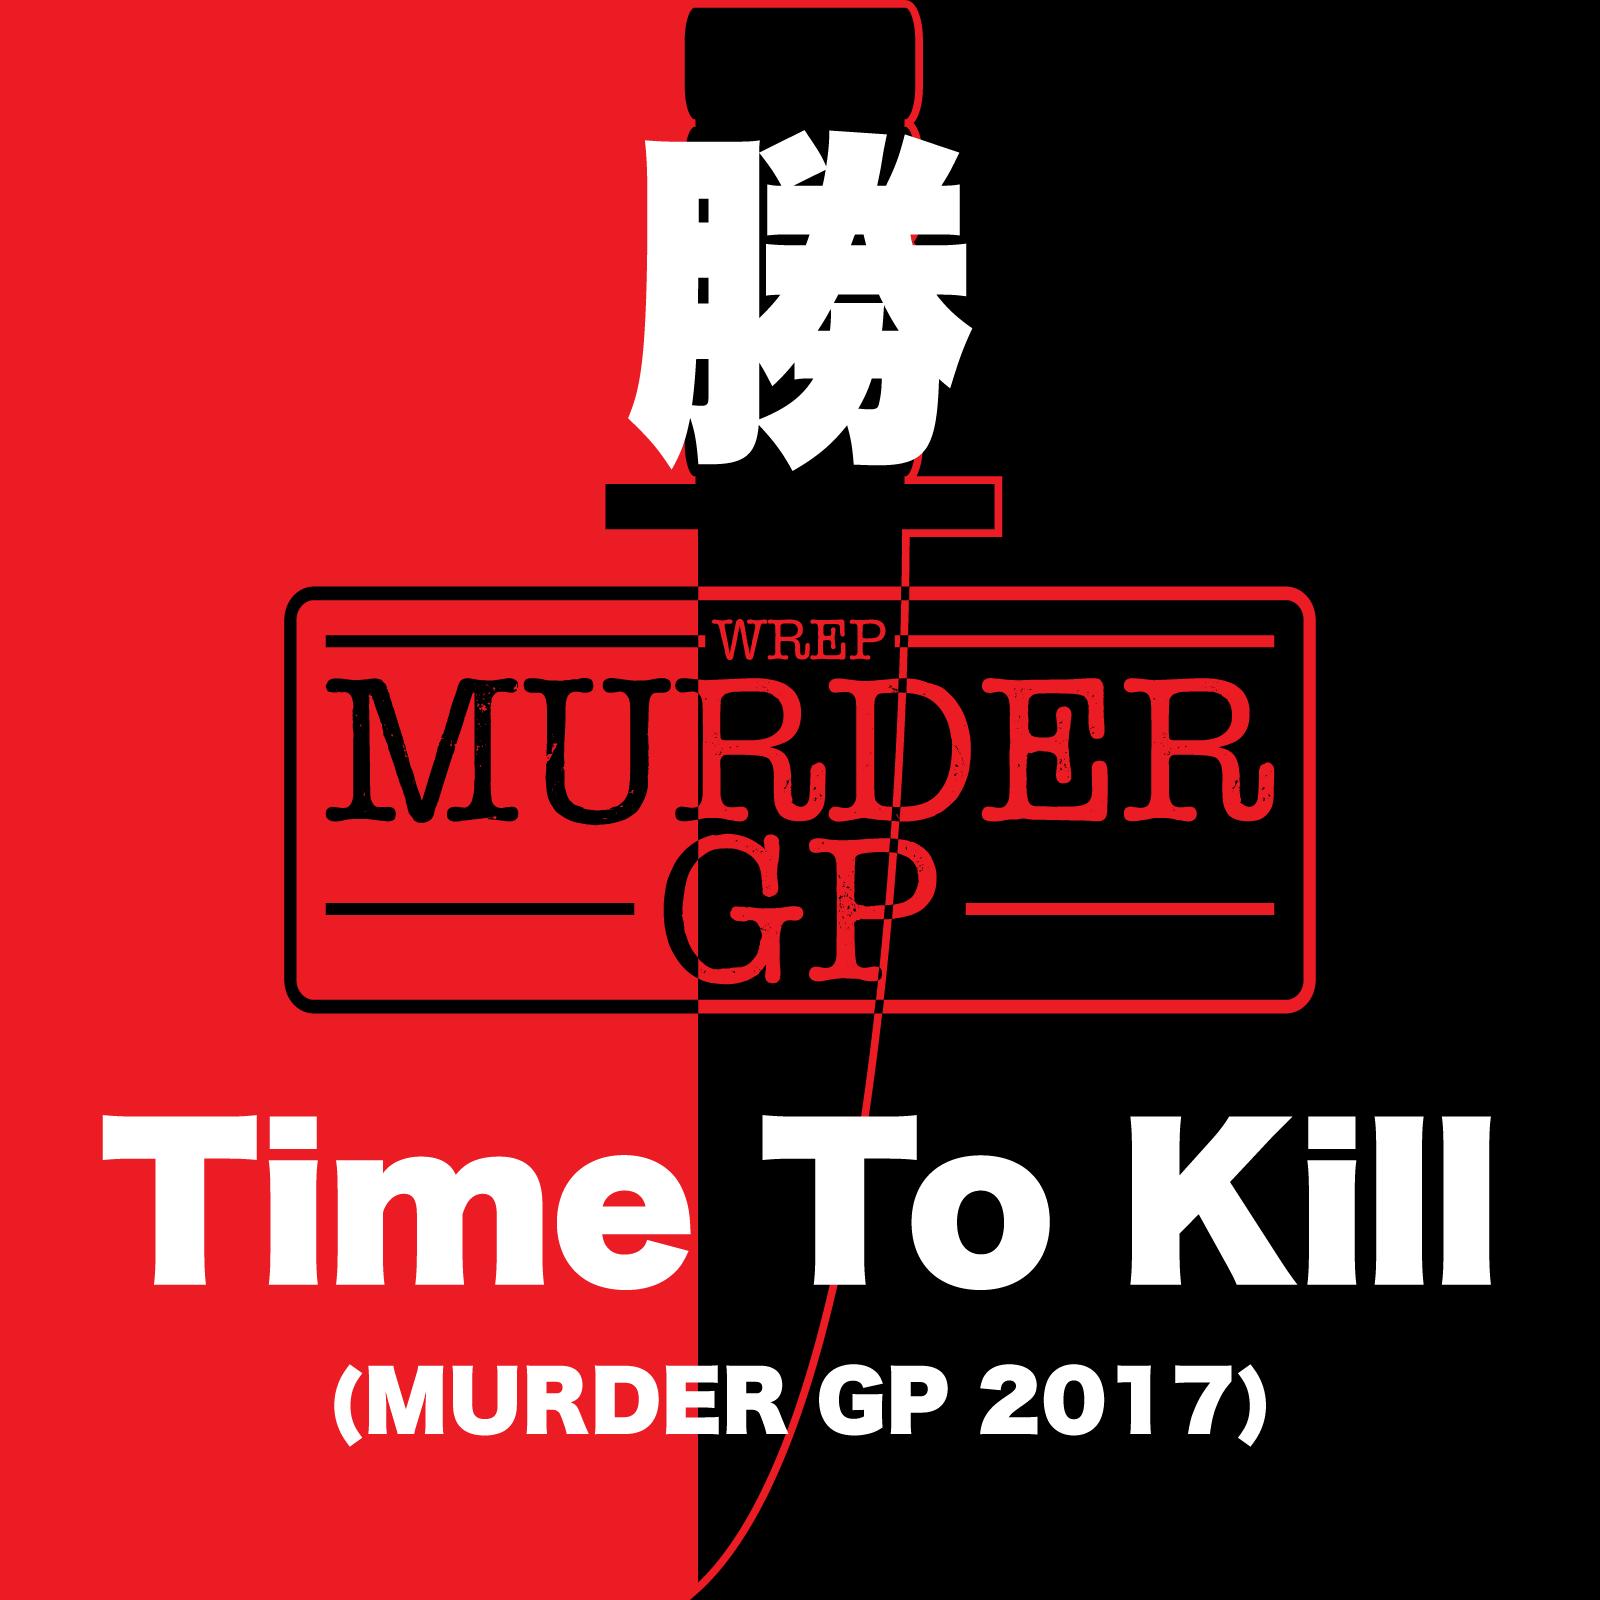 TimeToKillMurderGP2017.png